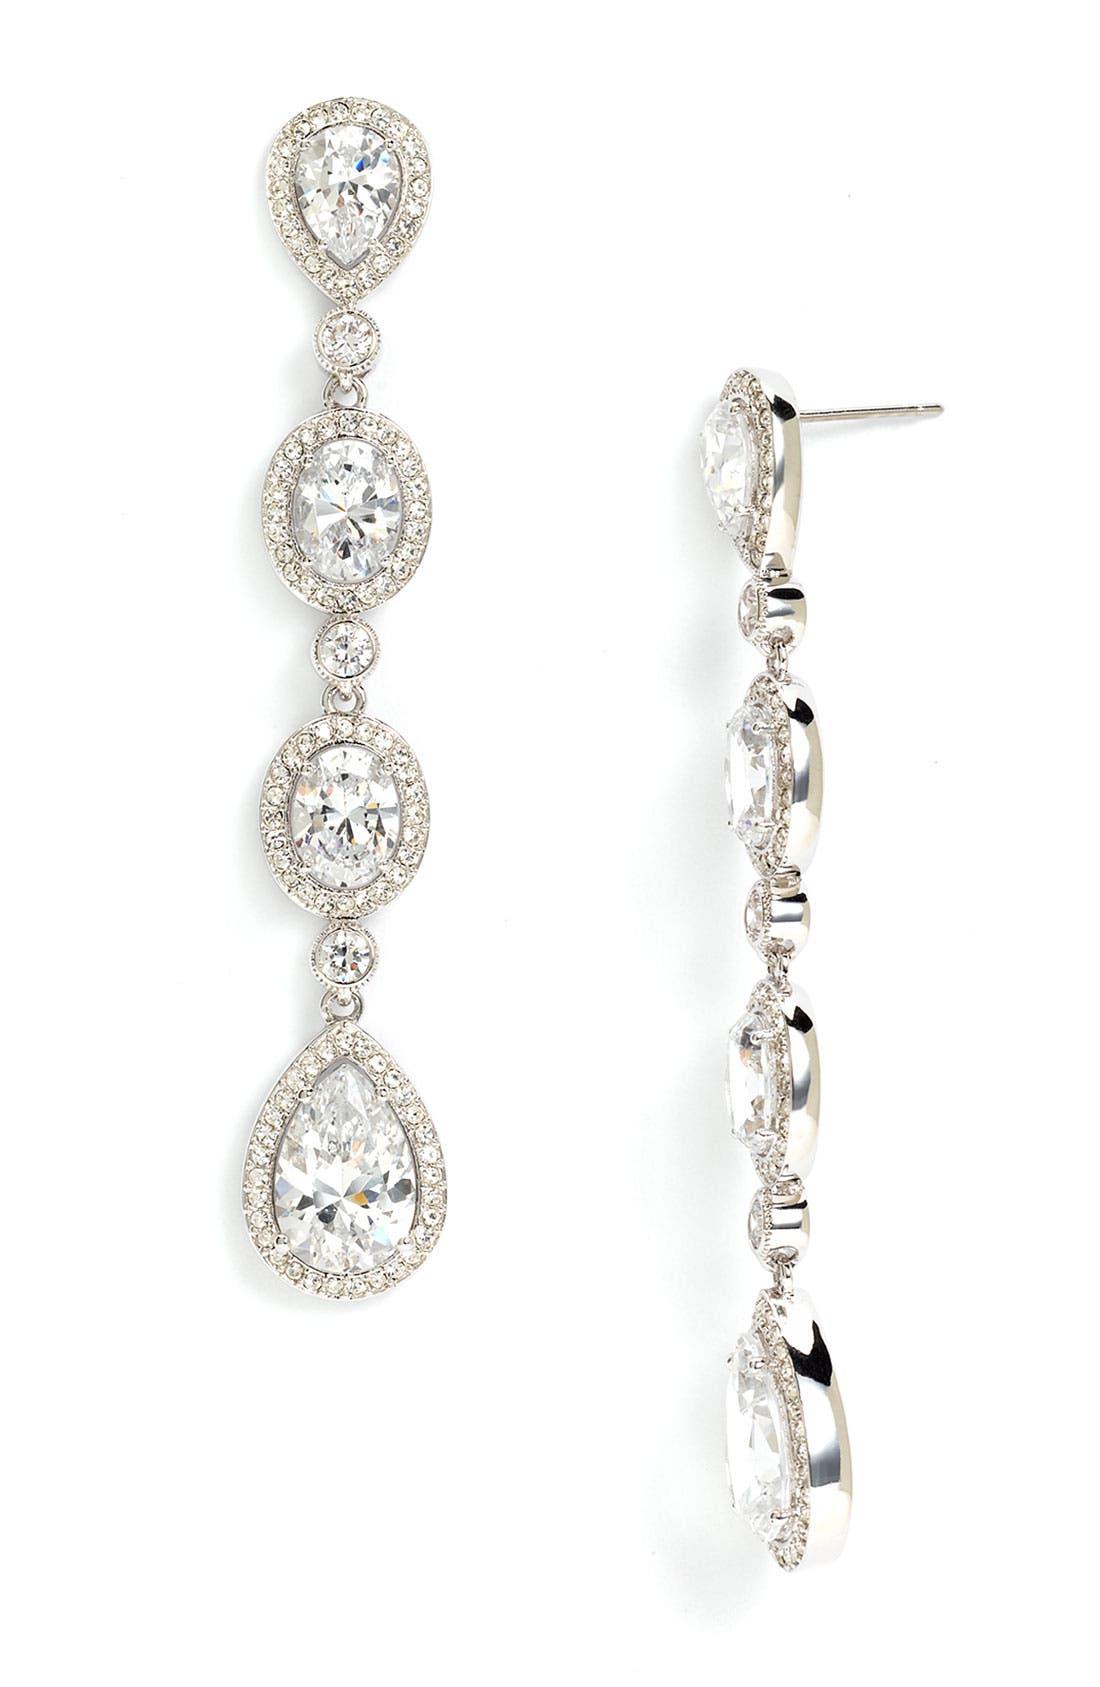 Alternate Image 1 Selected - Nadri Framed Cubic Zirconia Earrings